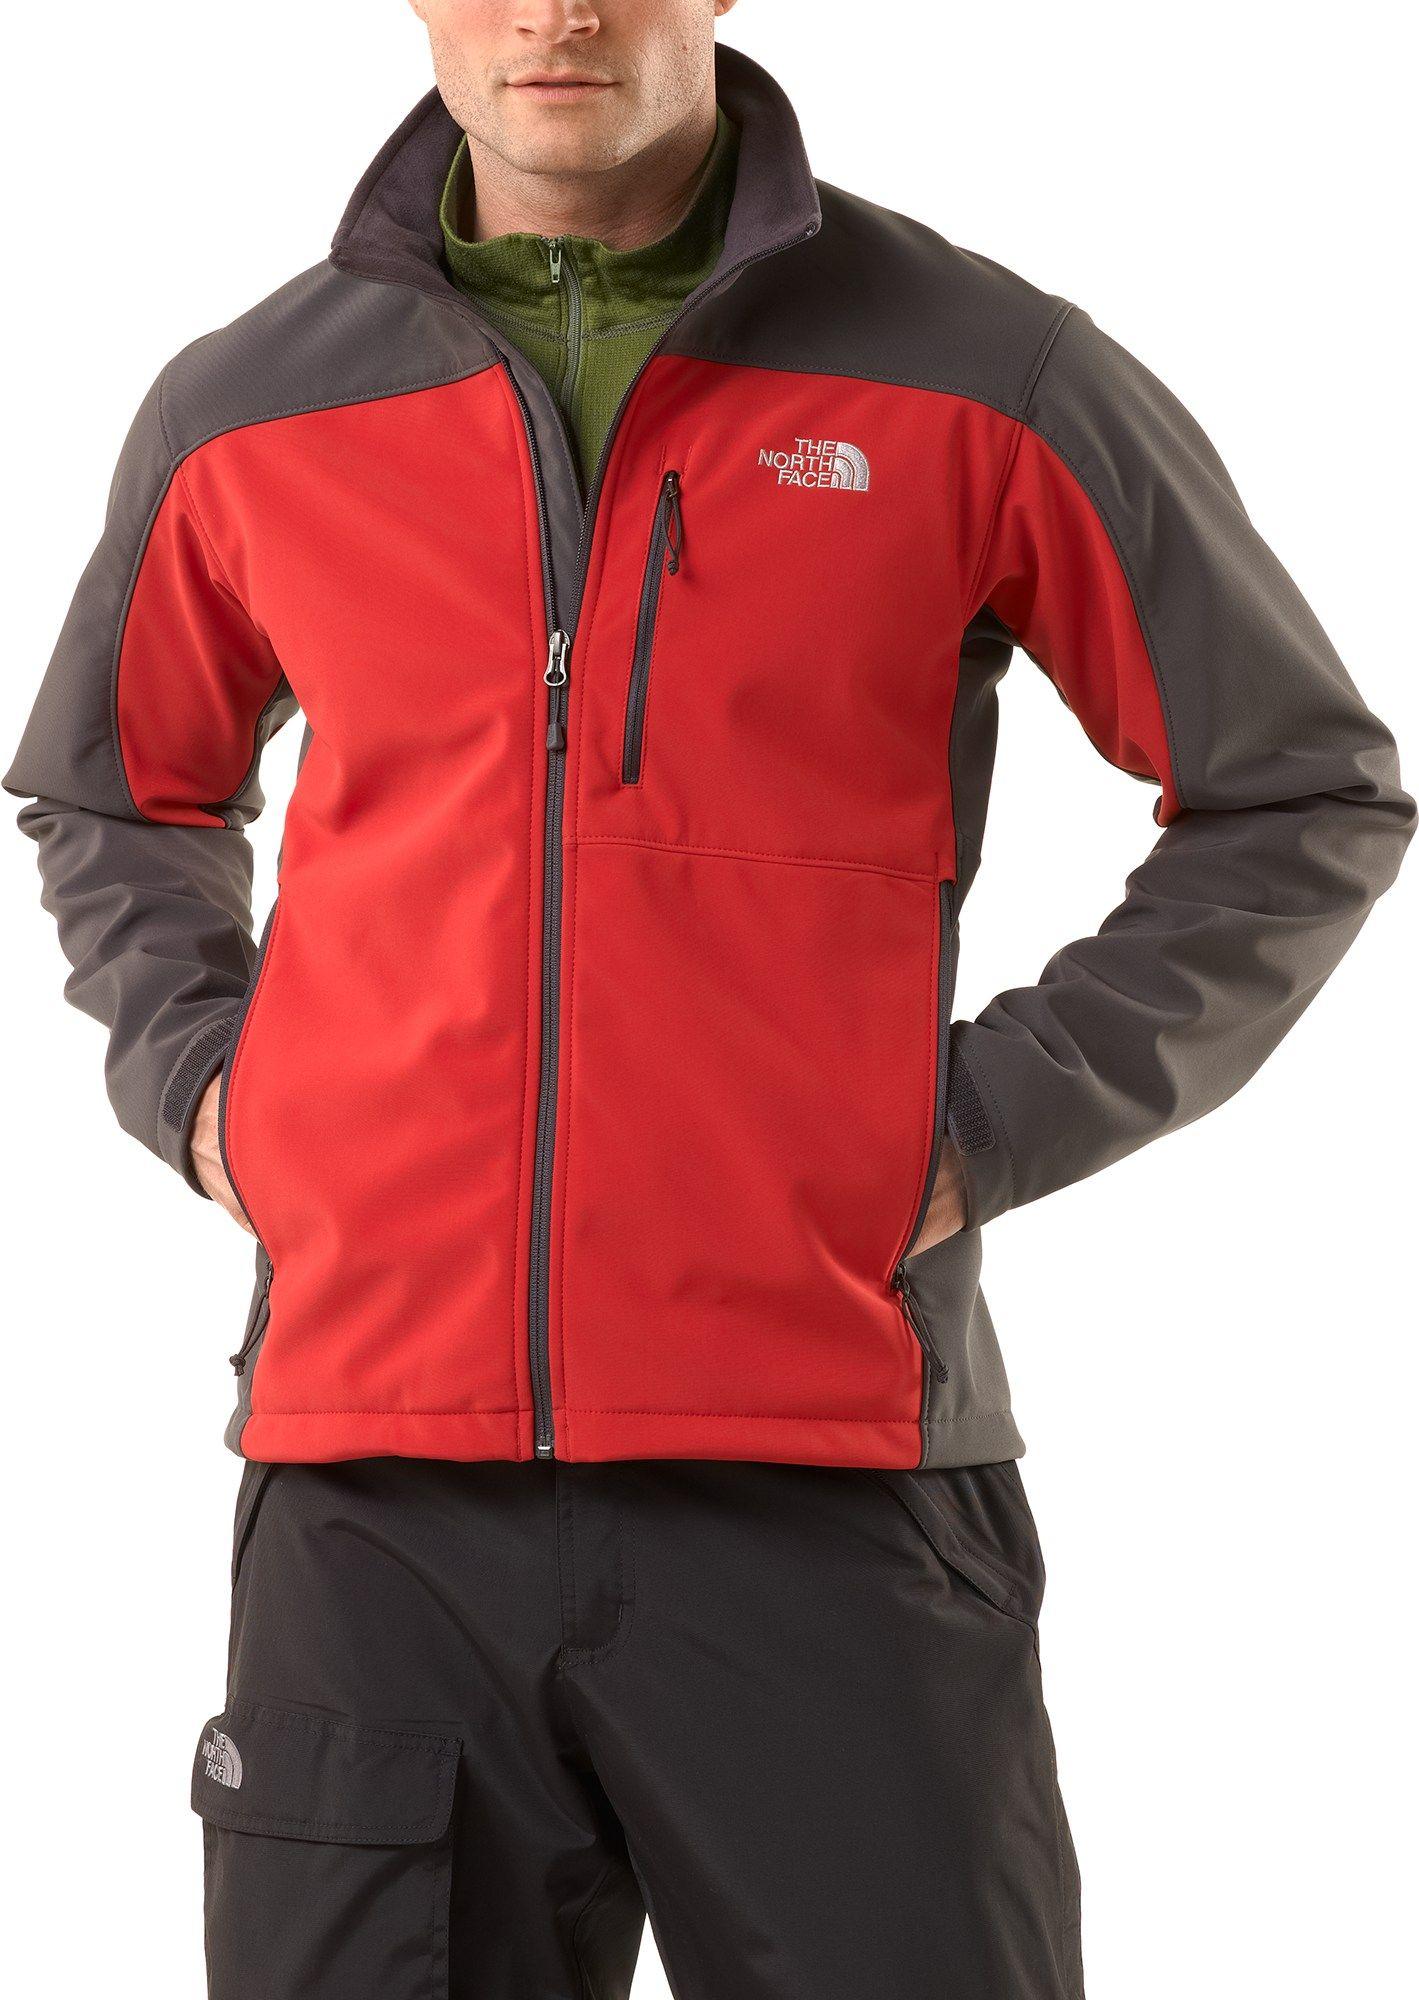 The North Face Apex Bionic Jacket Men S Rei Co Op Mens Jackets Jackets Lightweight Rain Jacket [ 2000 x 1419 Pixel ]